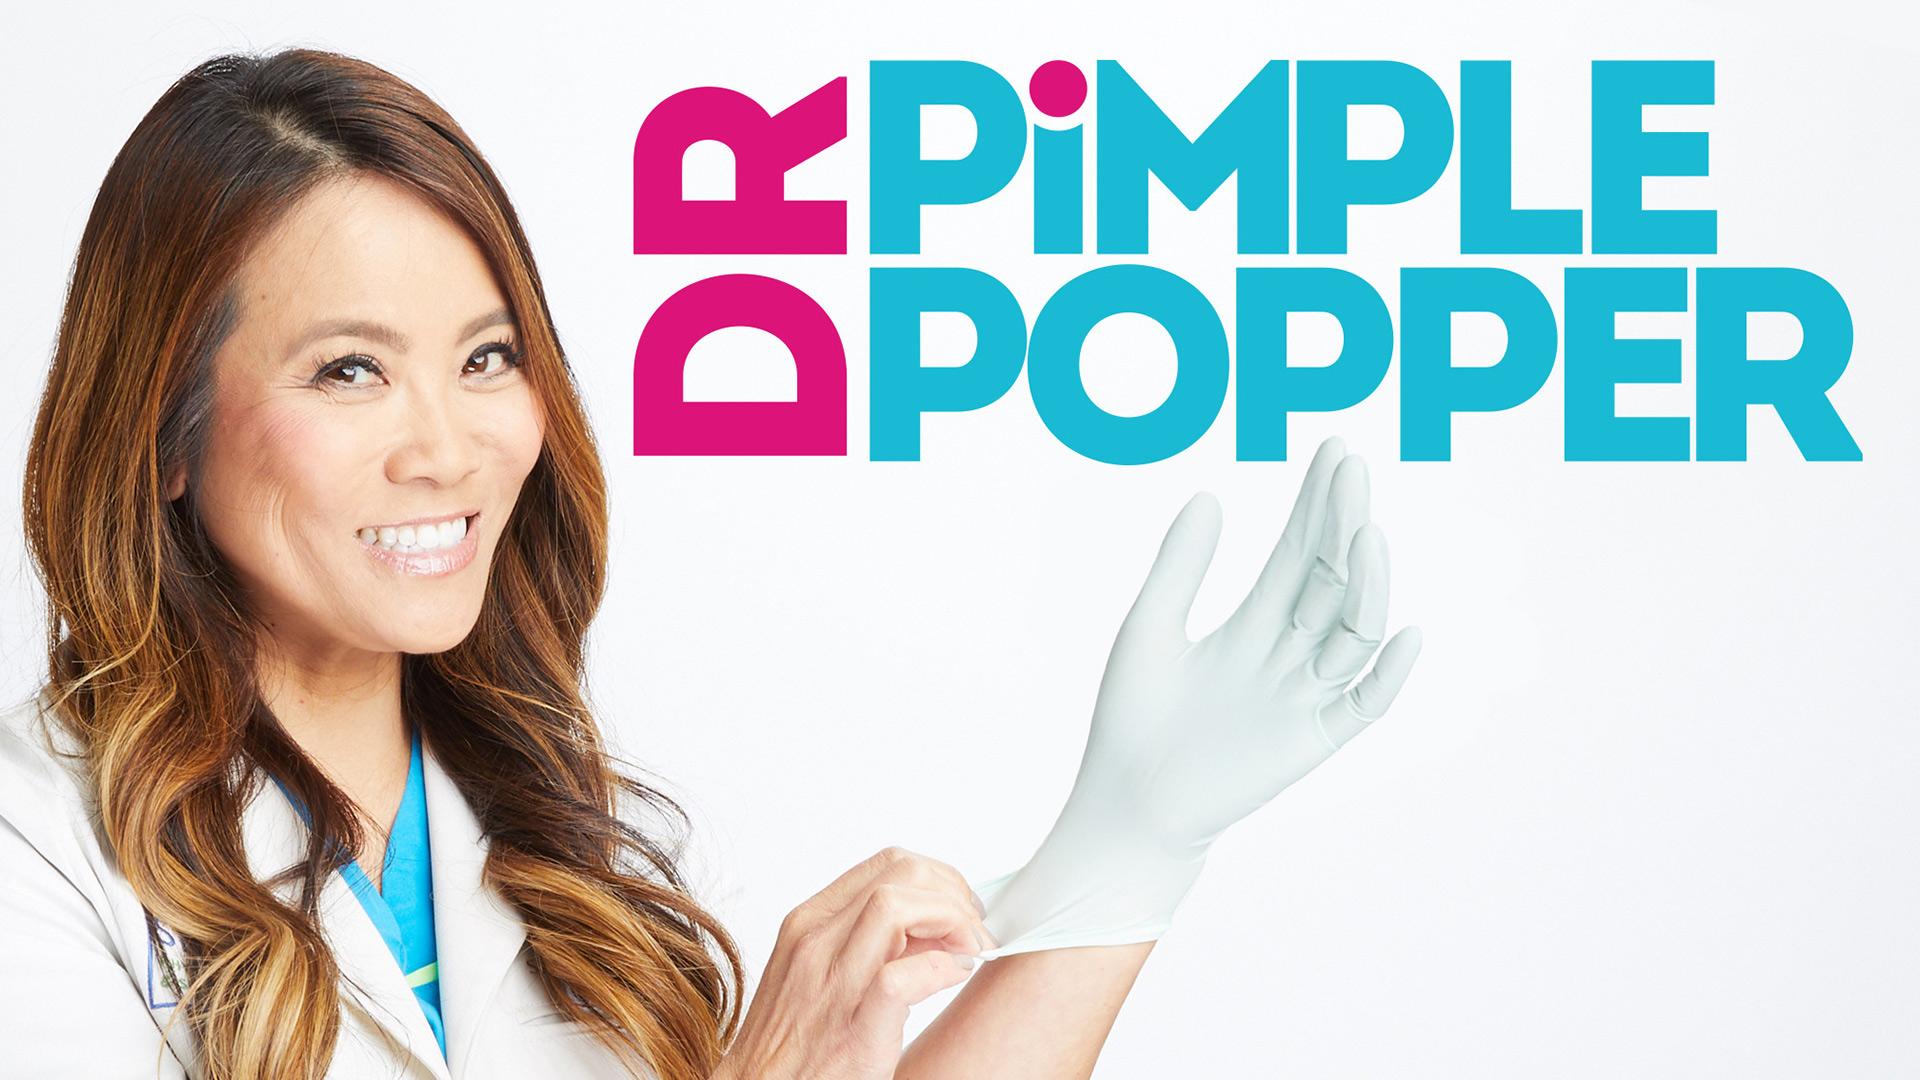 Dr. Pimple Popper Season 1